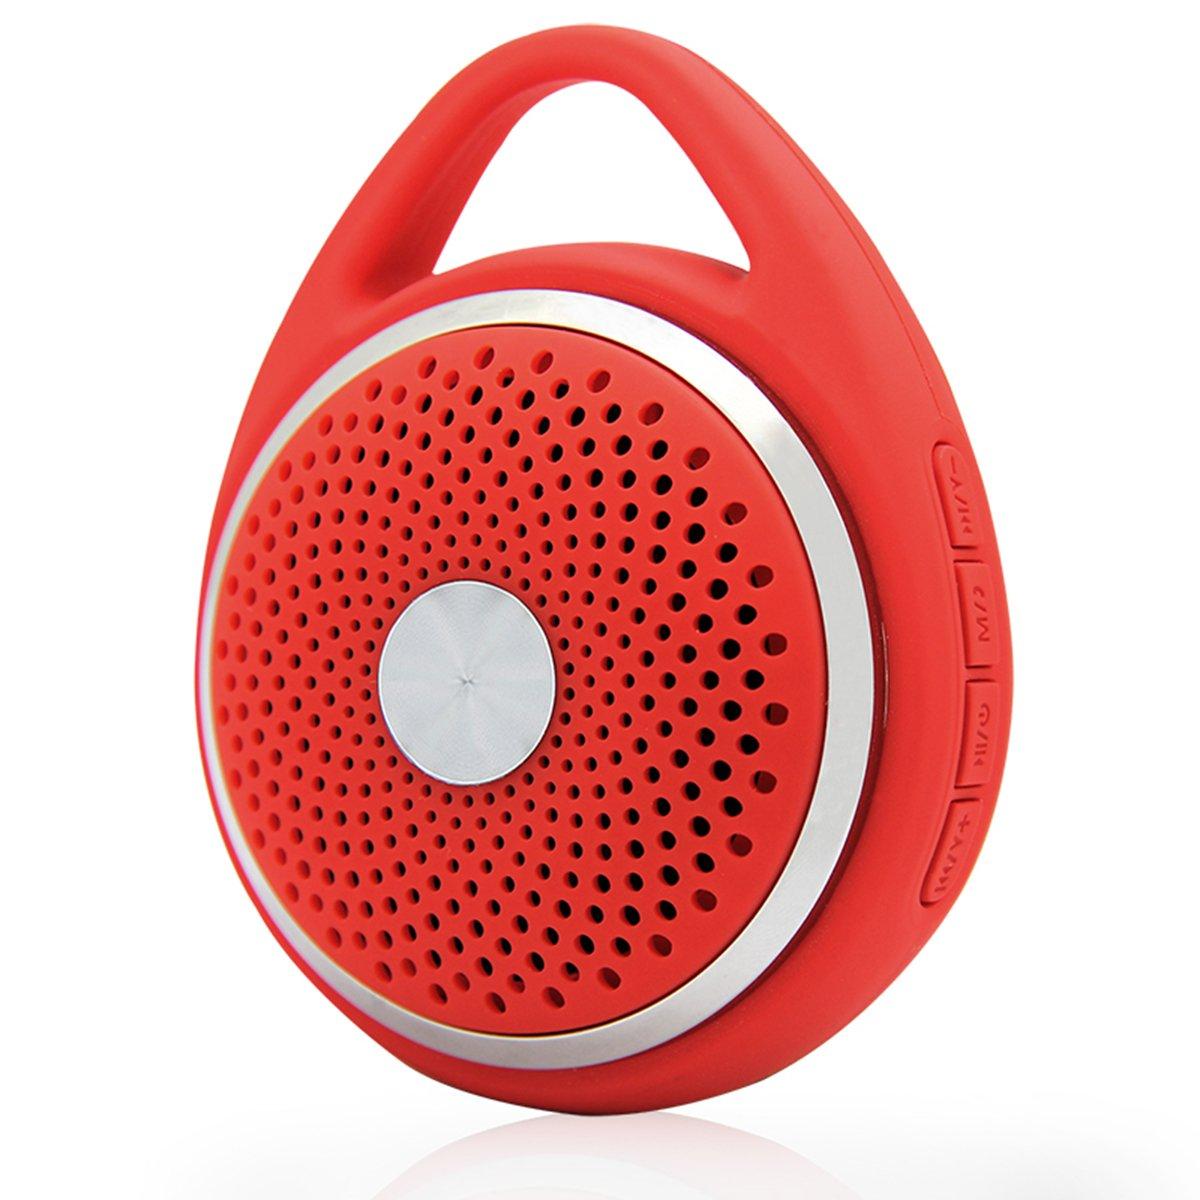 Gookee歌杰G7无线蓝牙音响/音箱可接听手机华为32gb电话图片